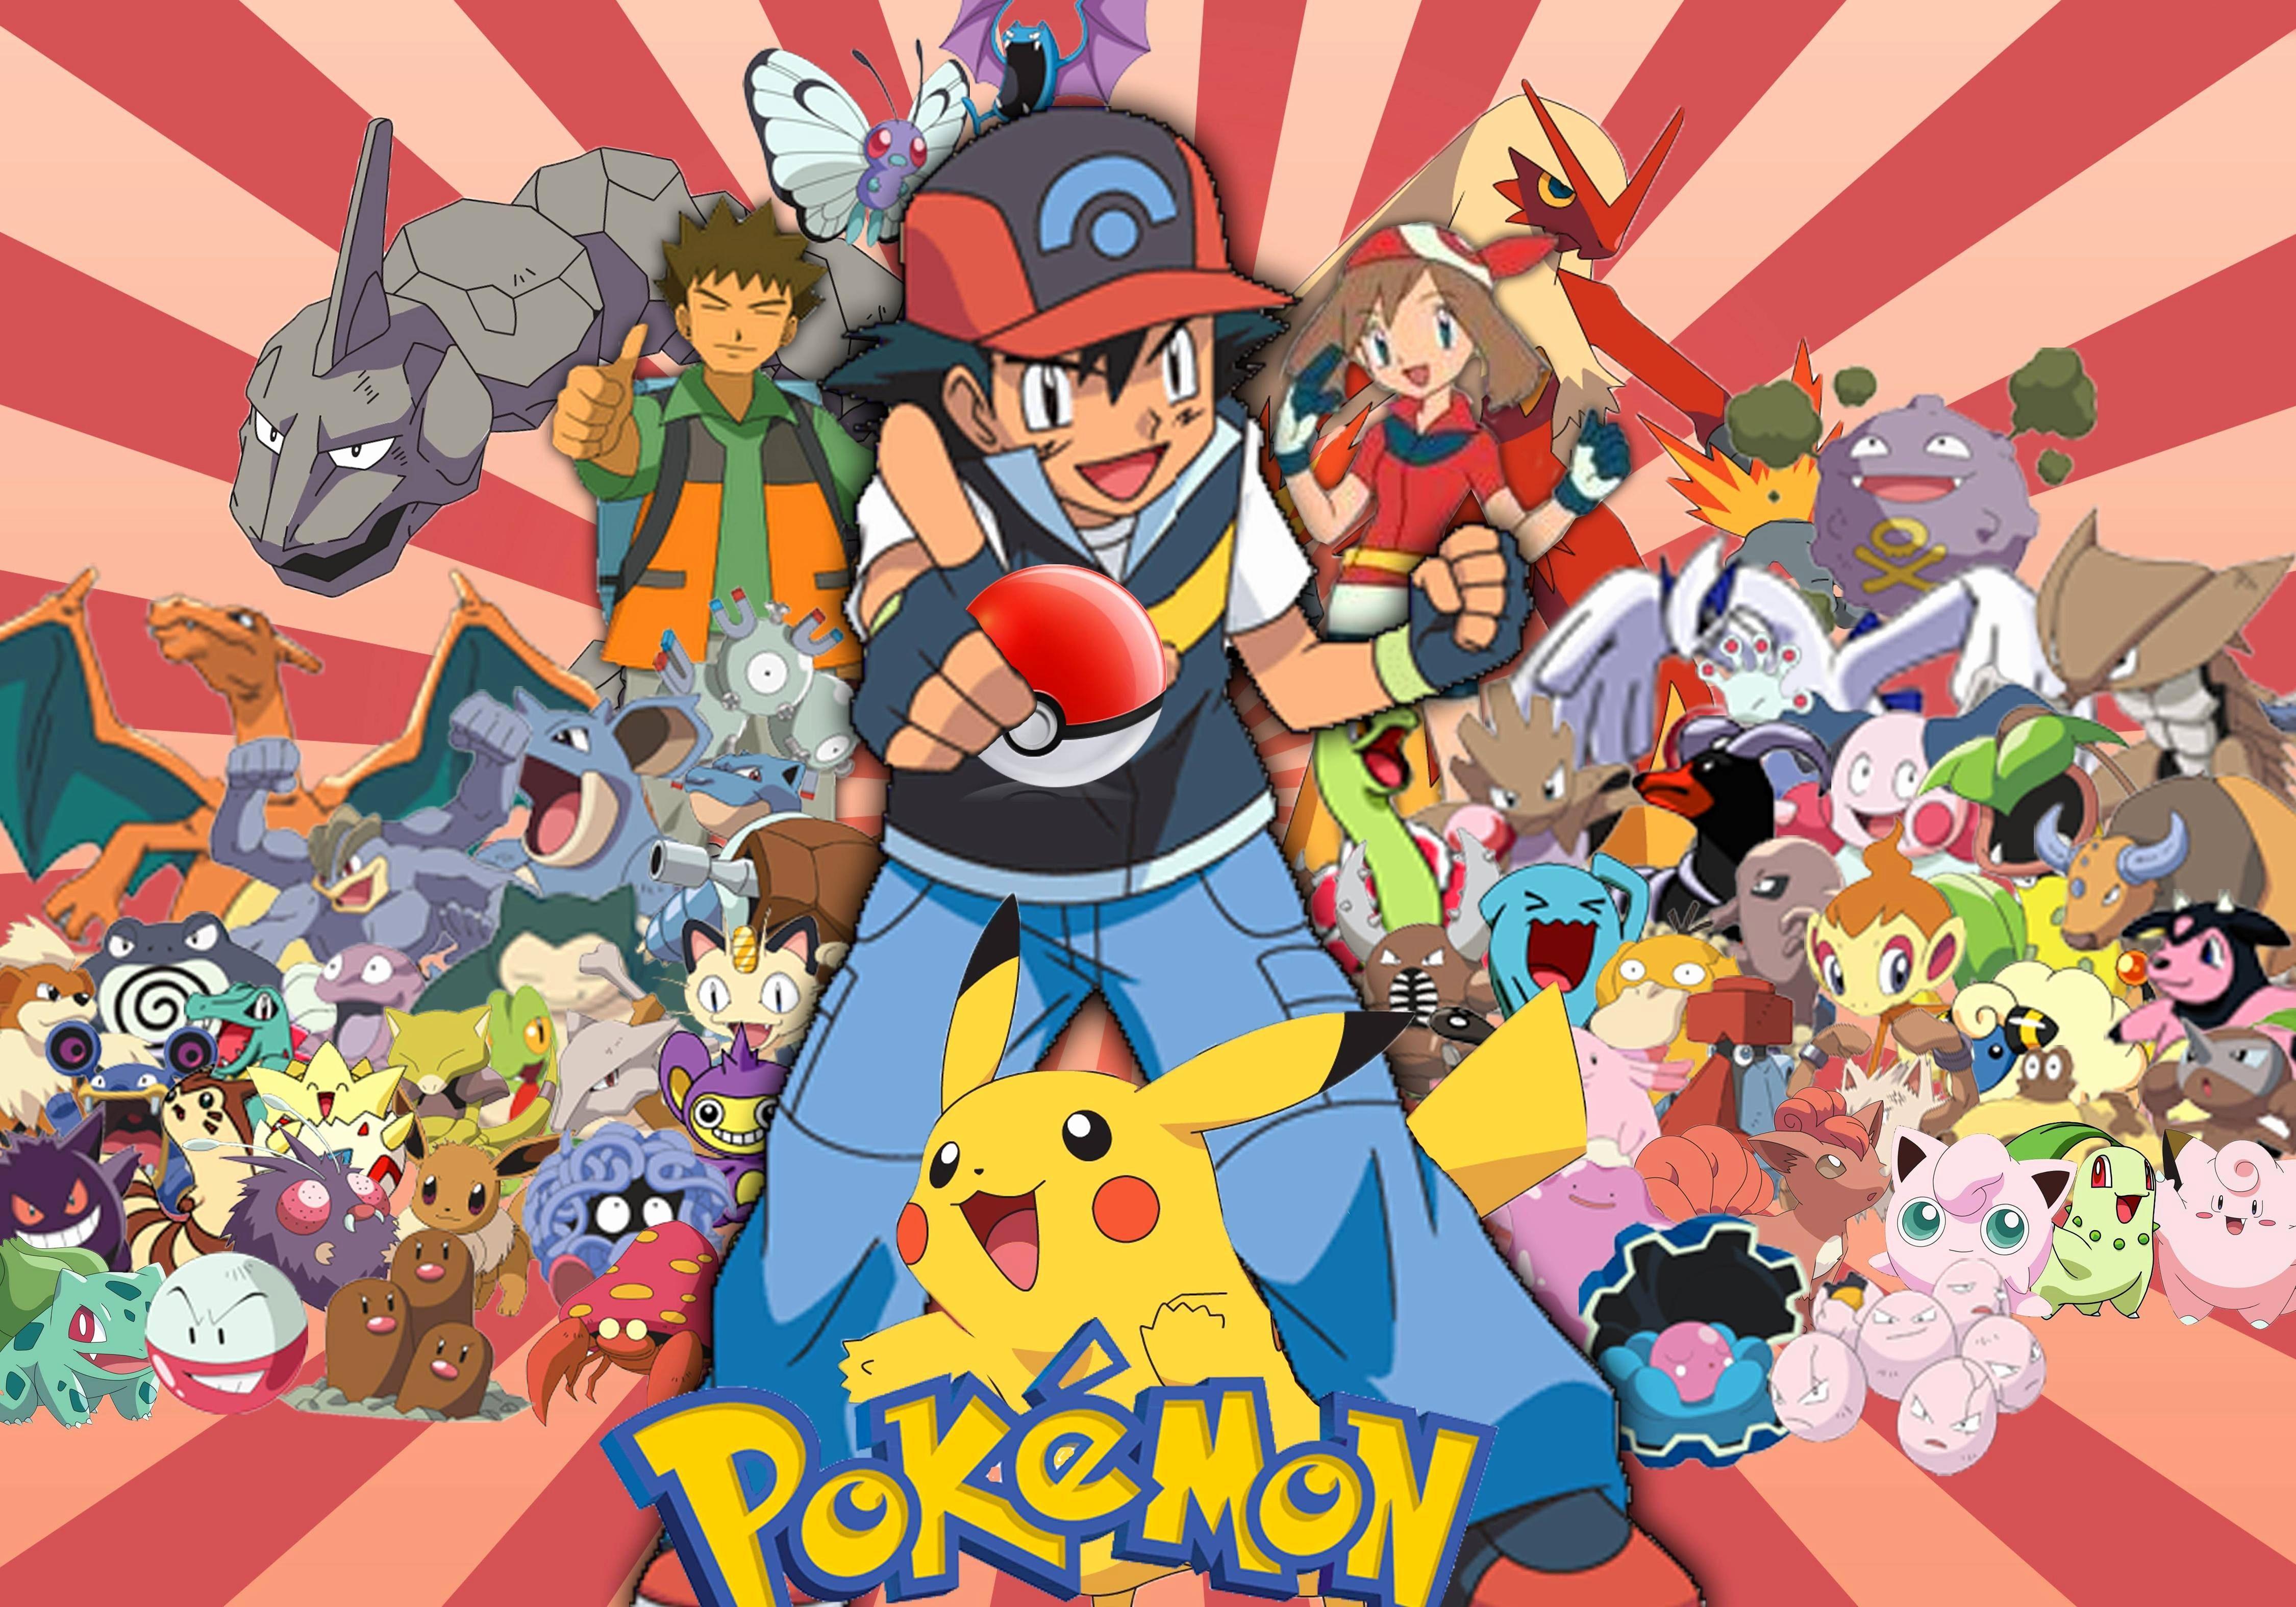 Pokemon Hd Wallpapers Top Free Pokemon Hd Backgrounds Wallpaperaccess